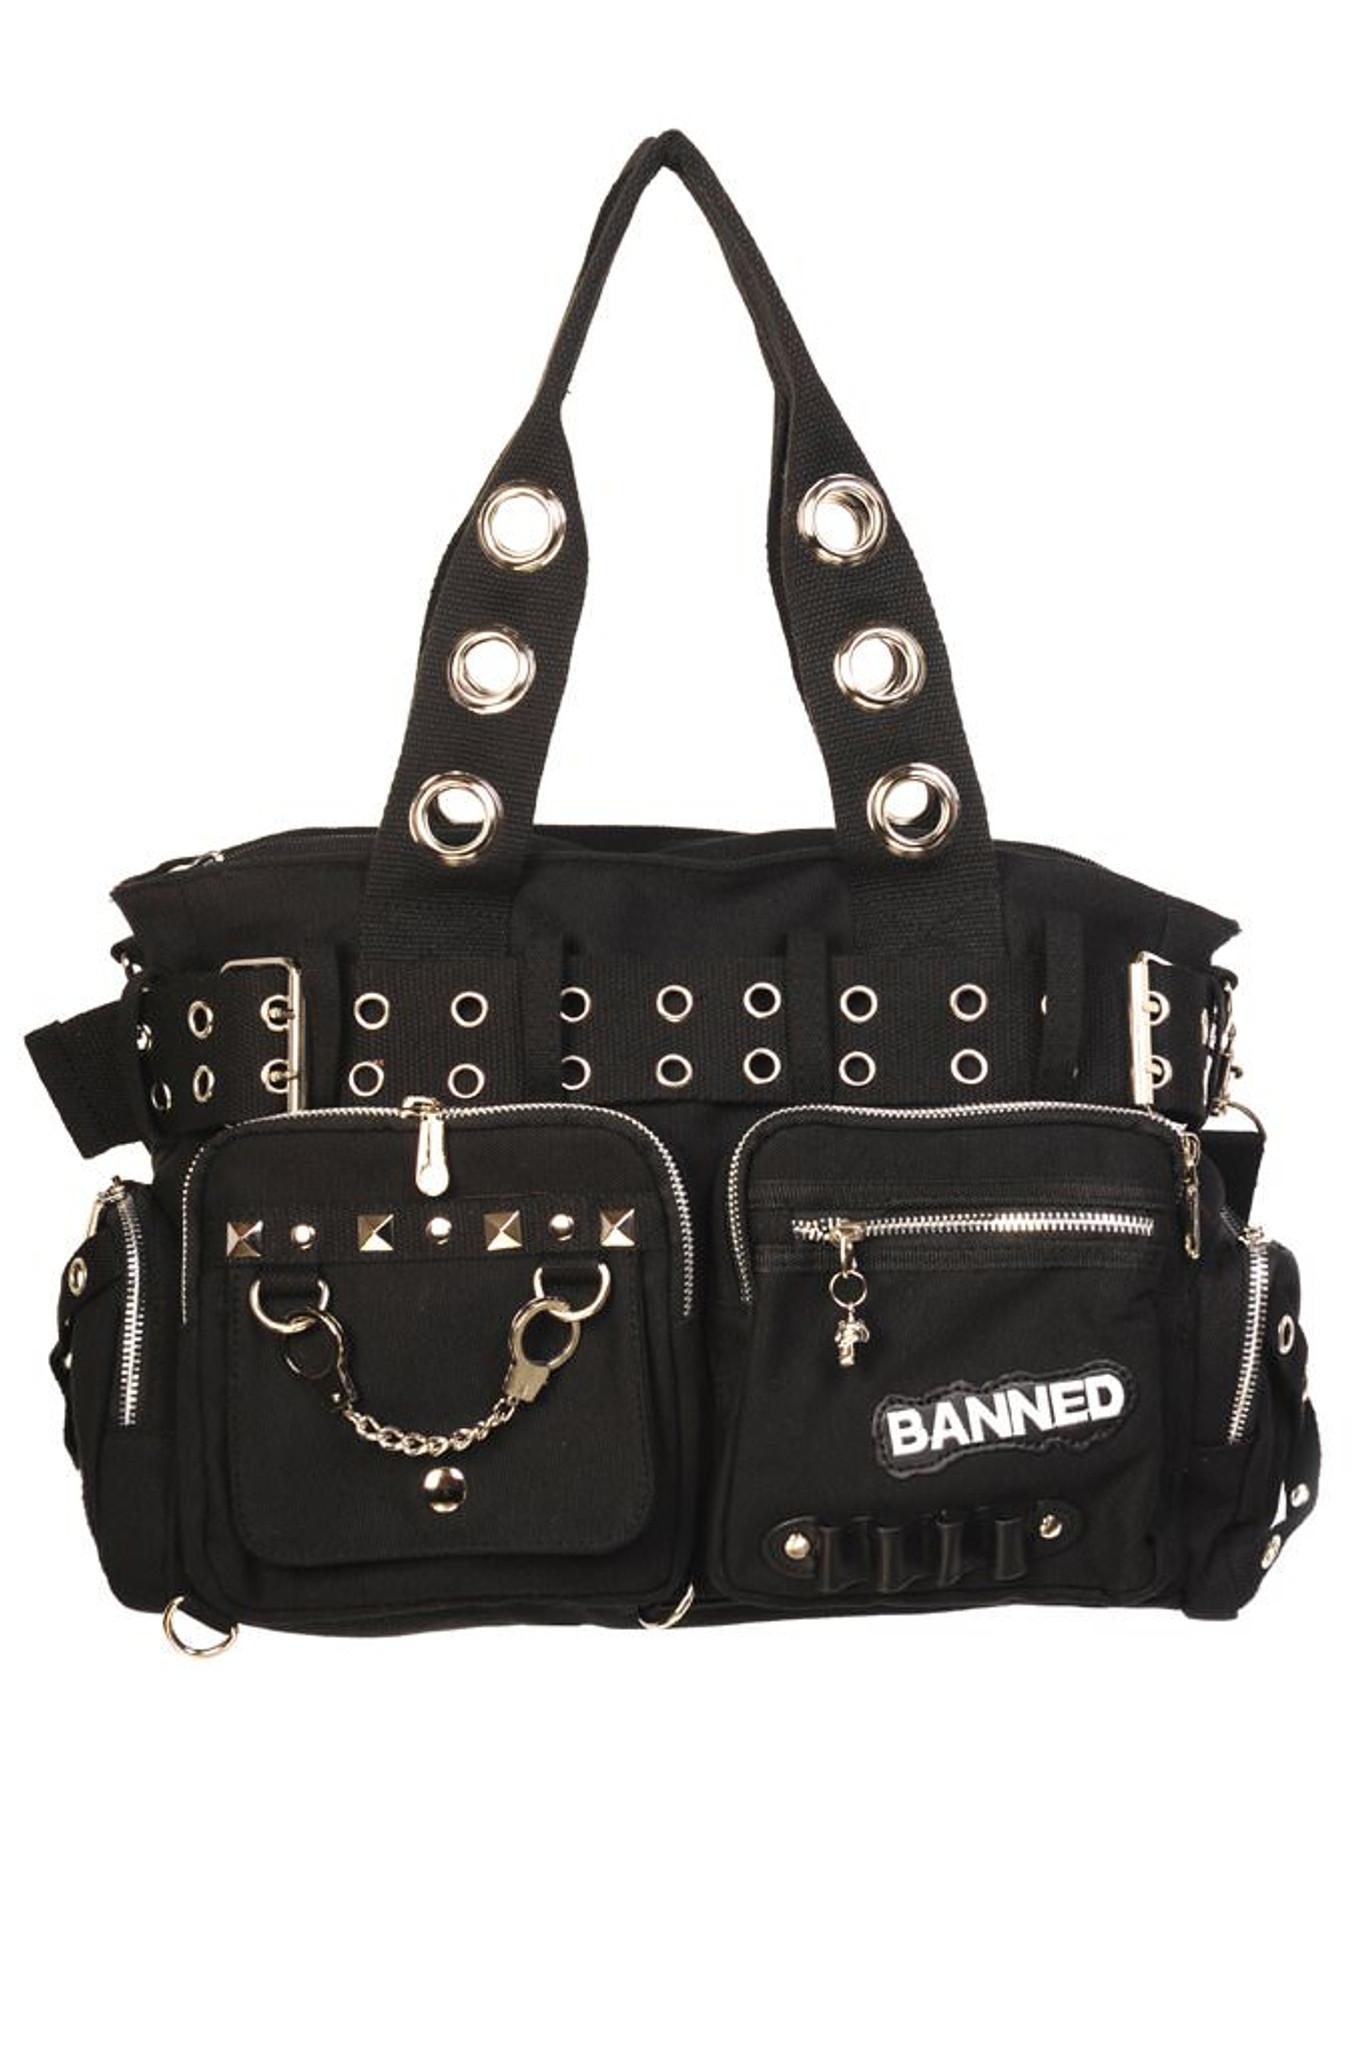 Handcuff Bag - Black